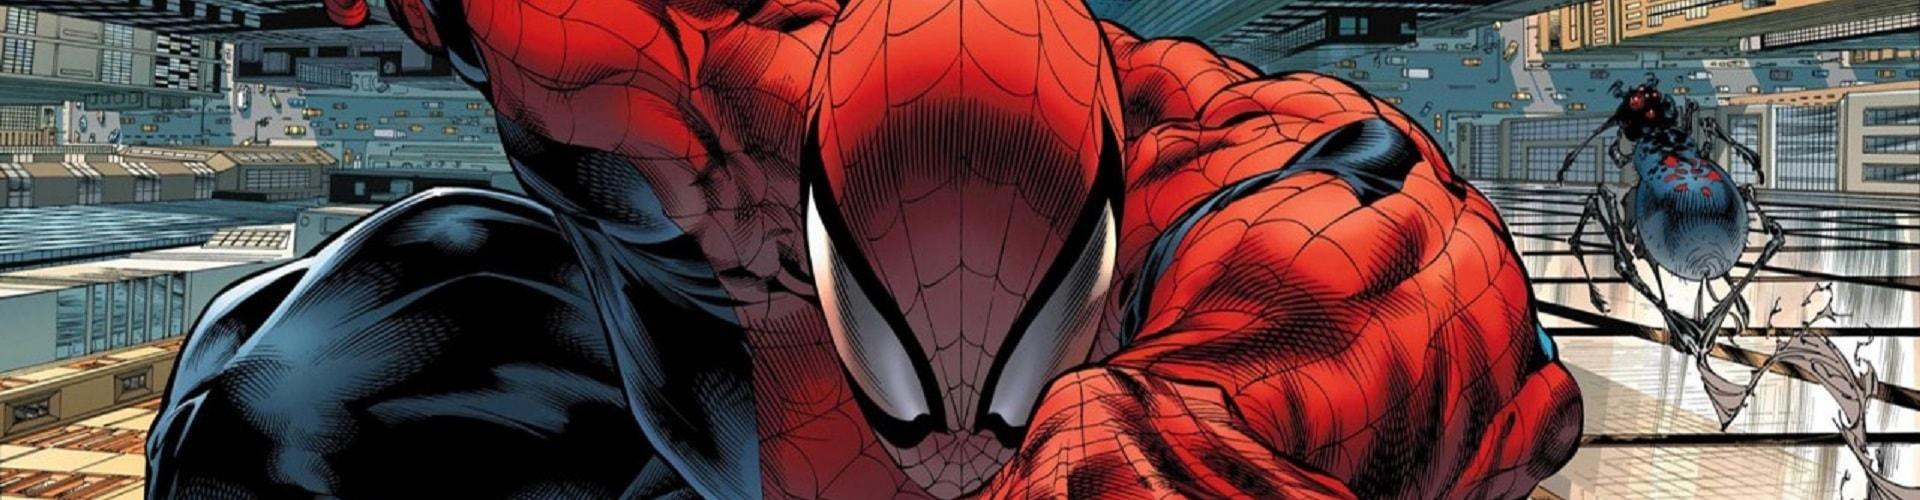 on sale this week spider-man